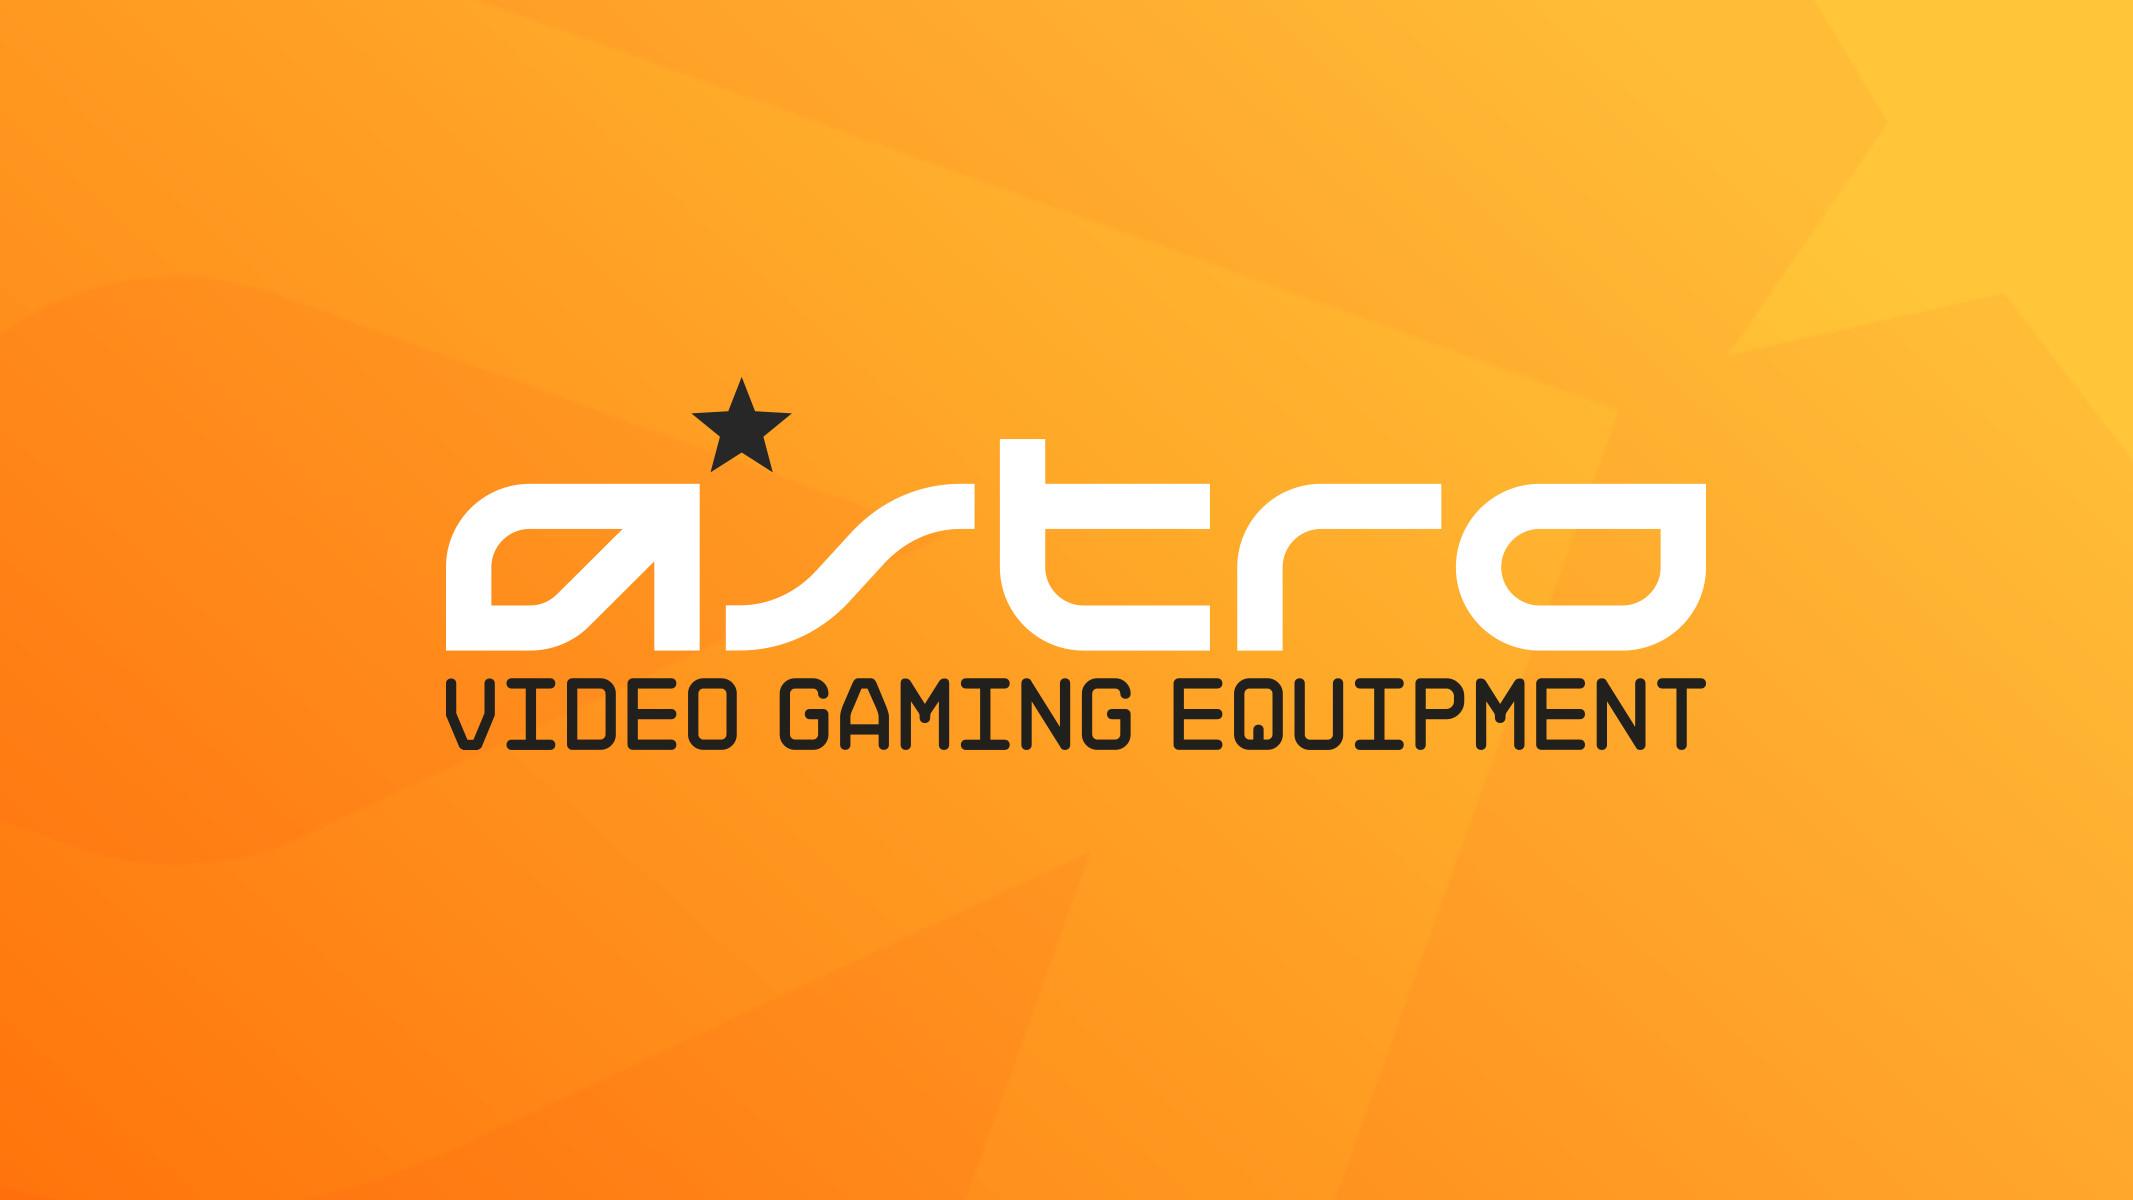 Astro Gaming Wallpaper – https://wallpaperzoo.com/astro-gaming-